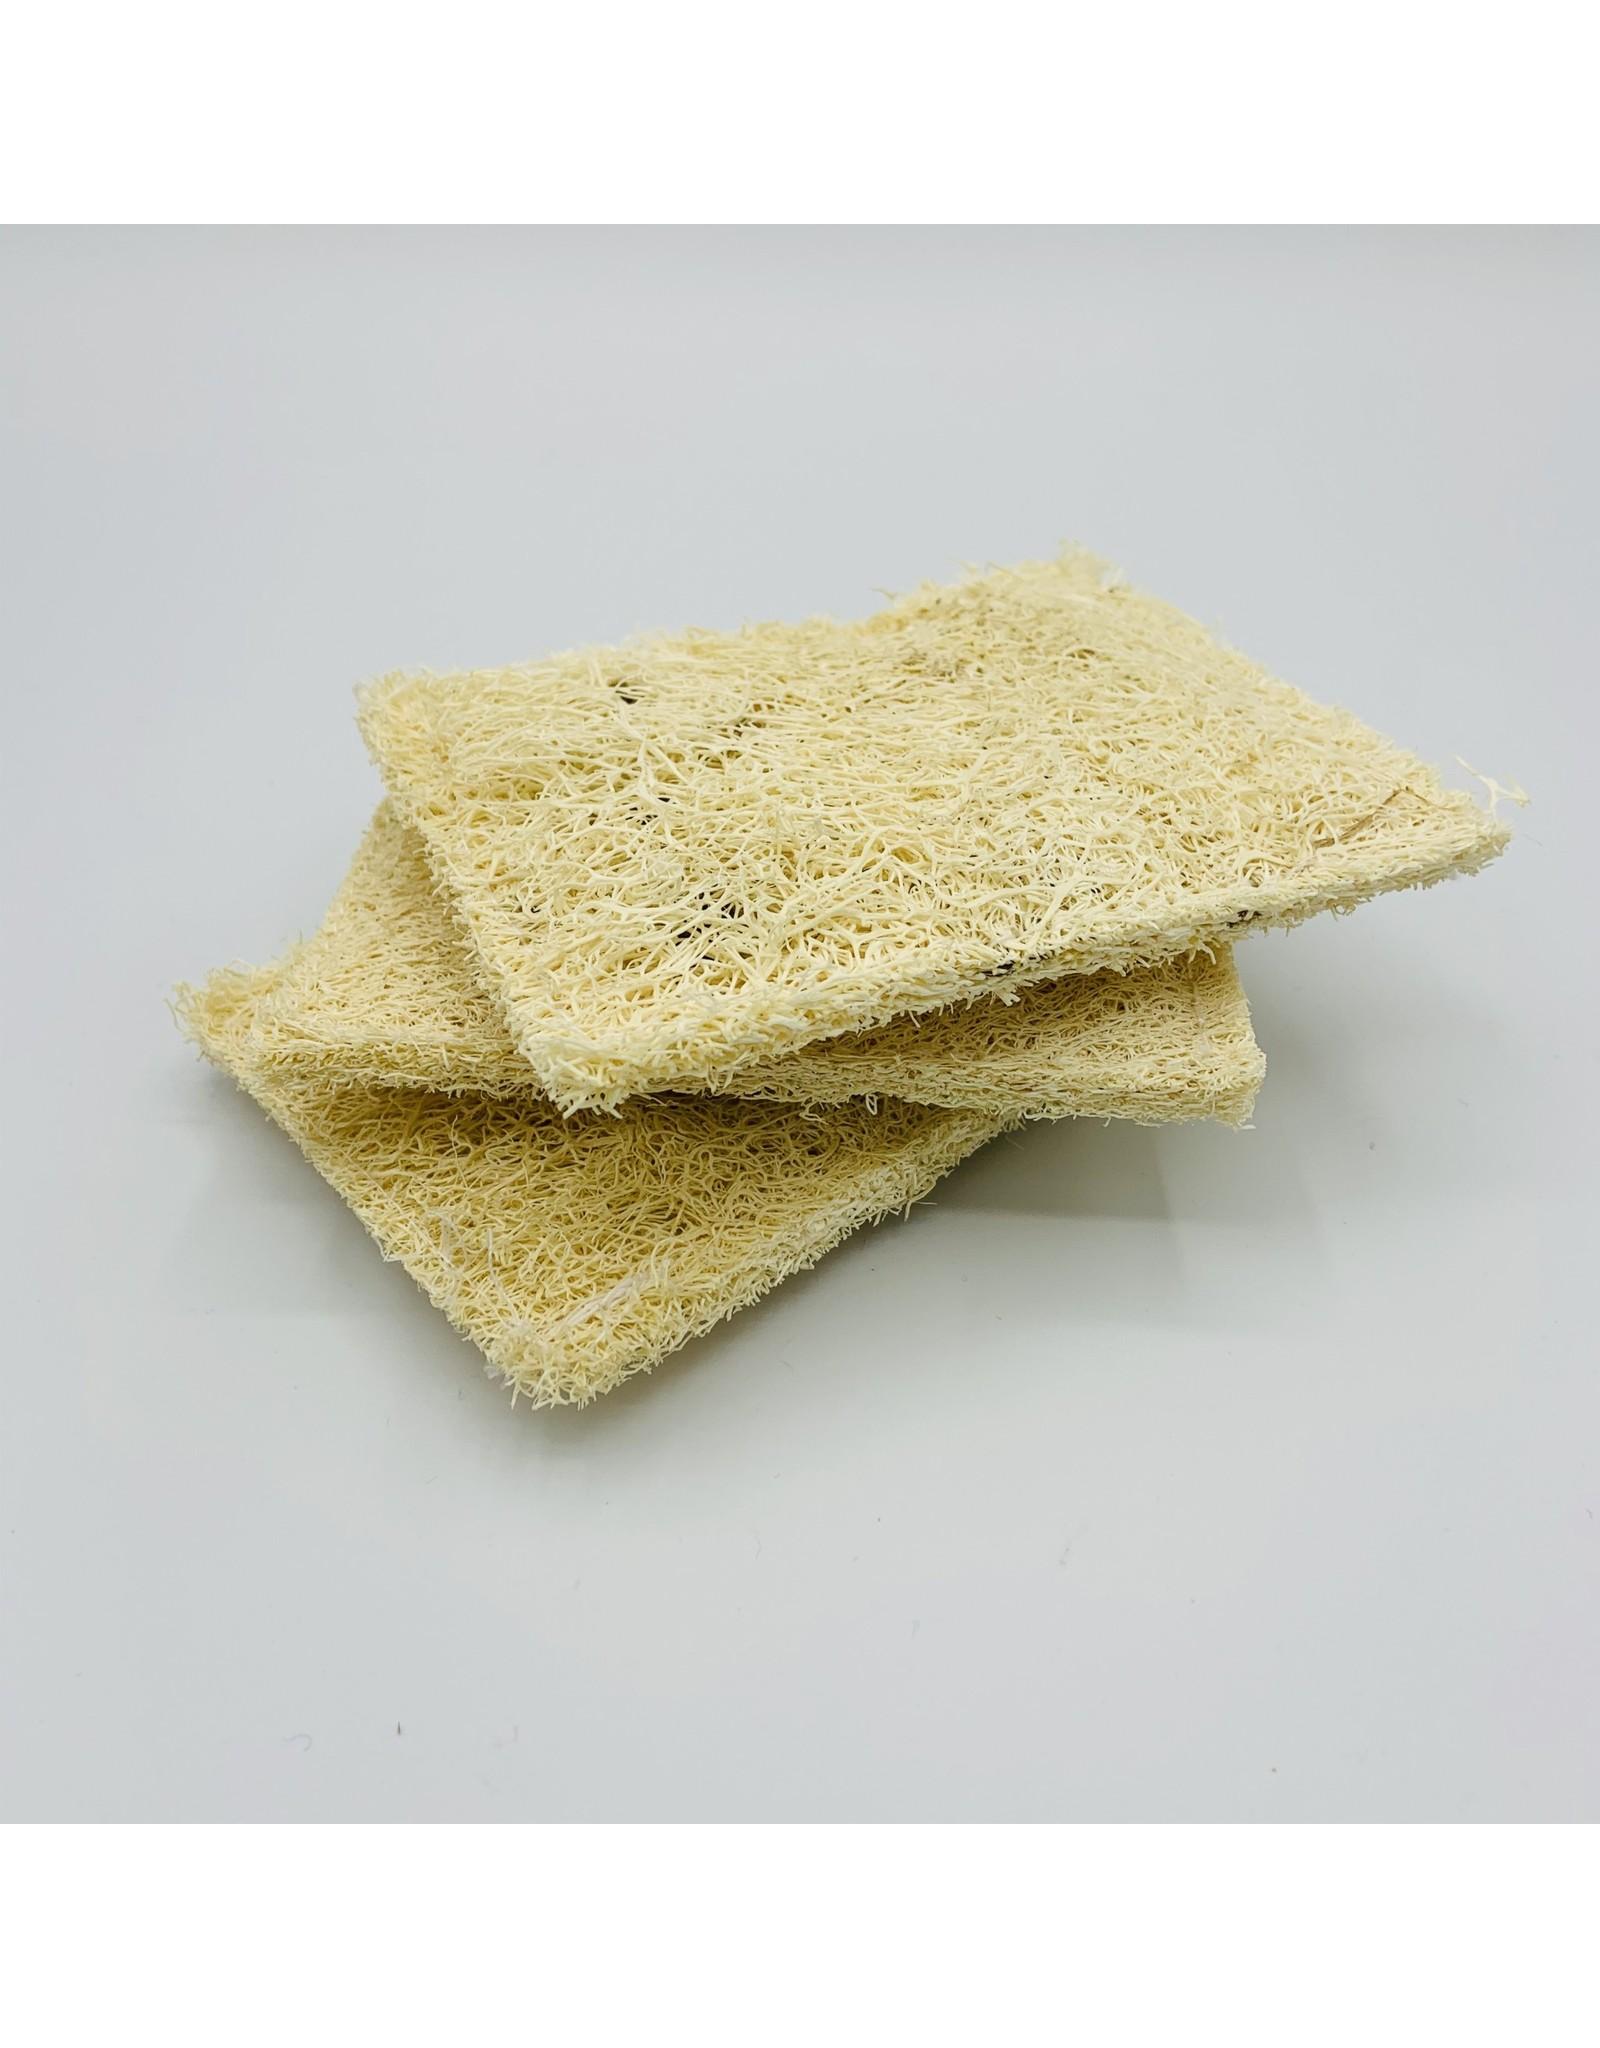 Sitti 3-Pack Bath & Body Loofah Sponges